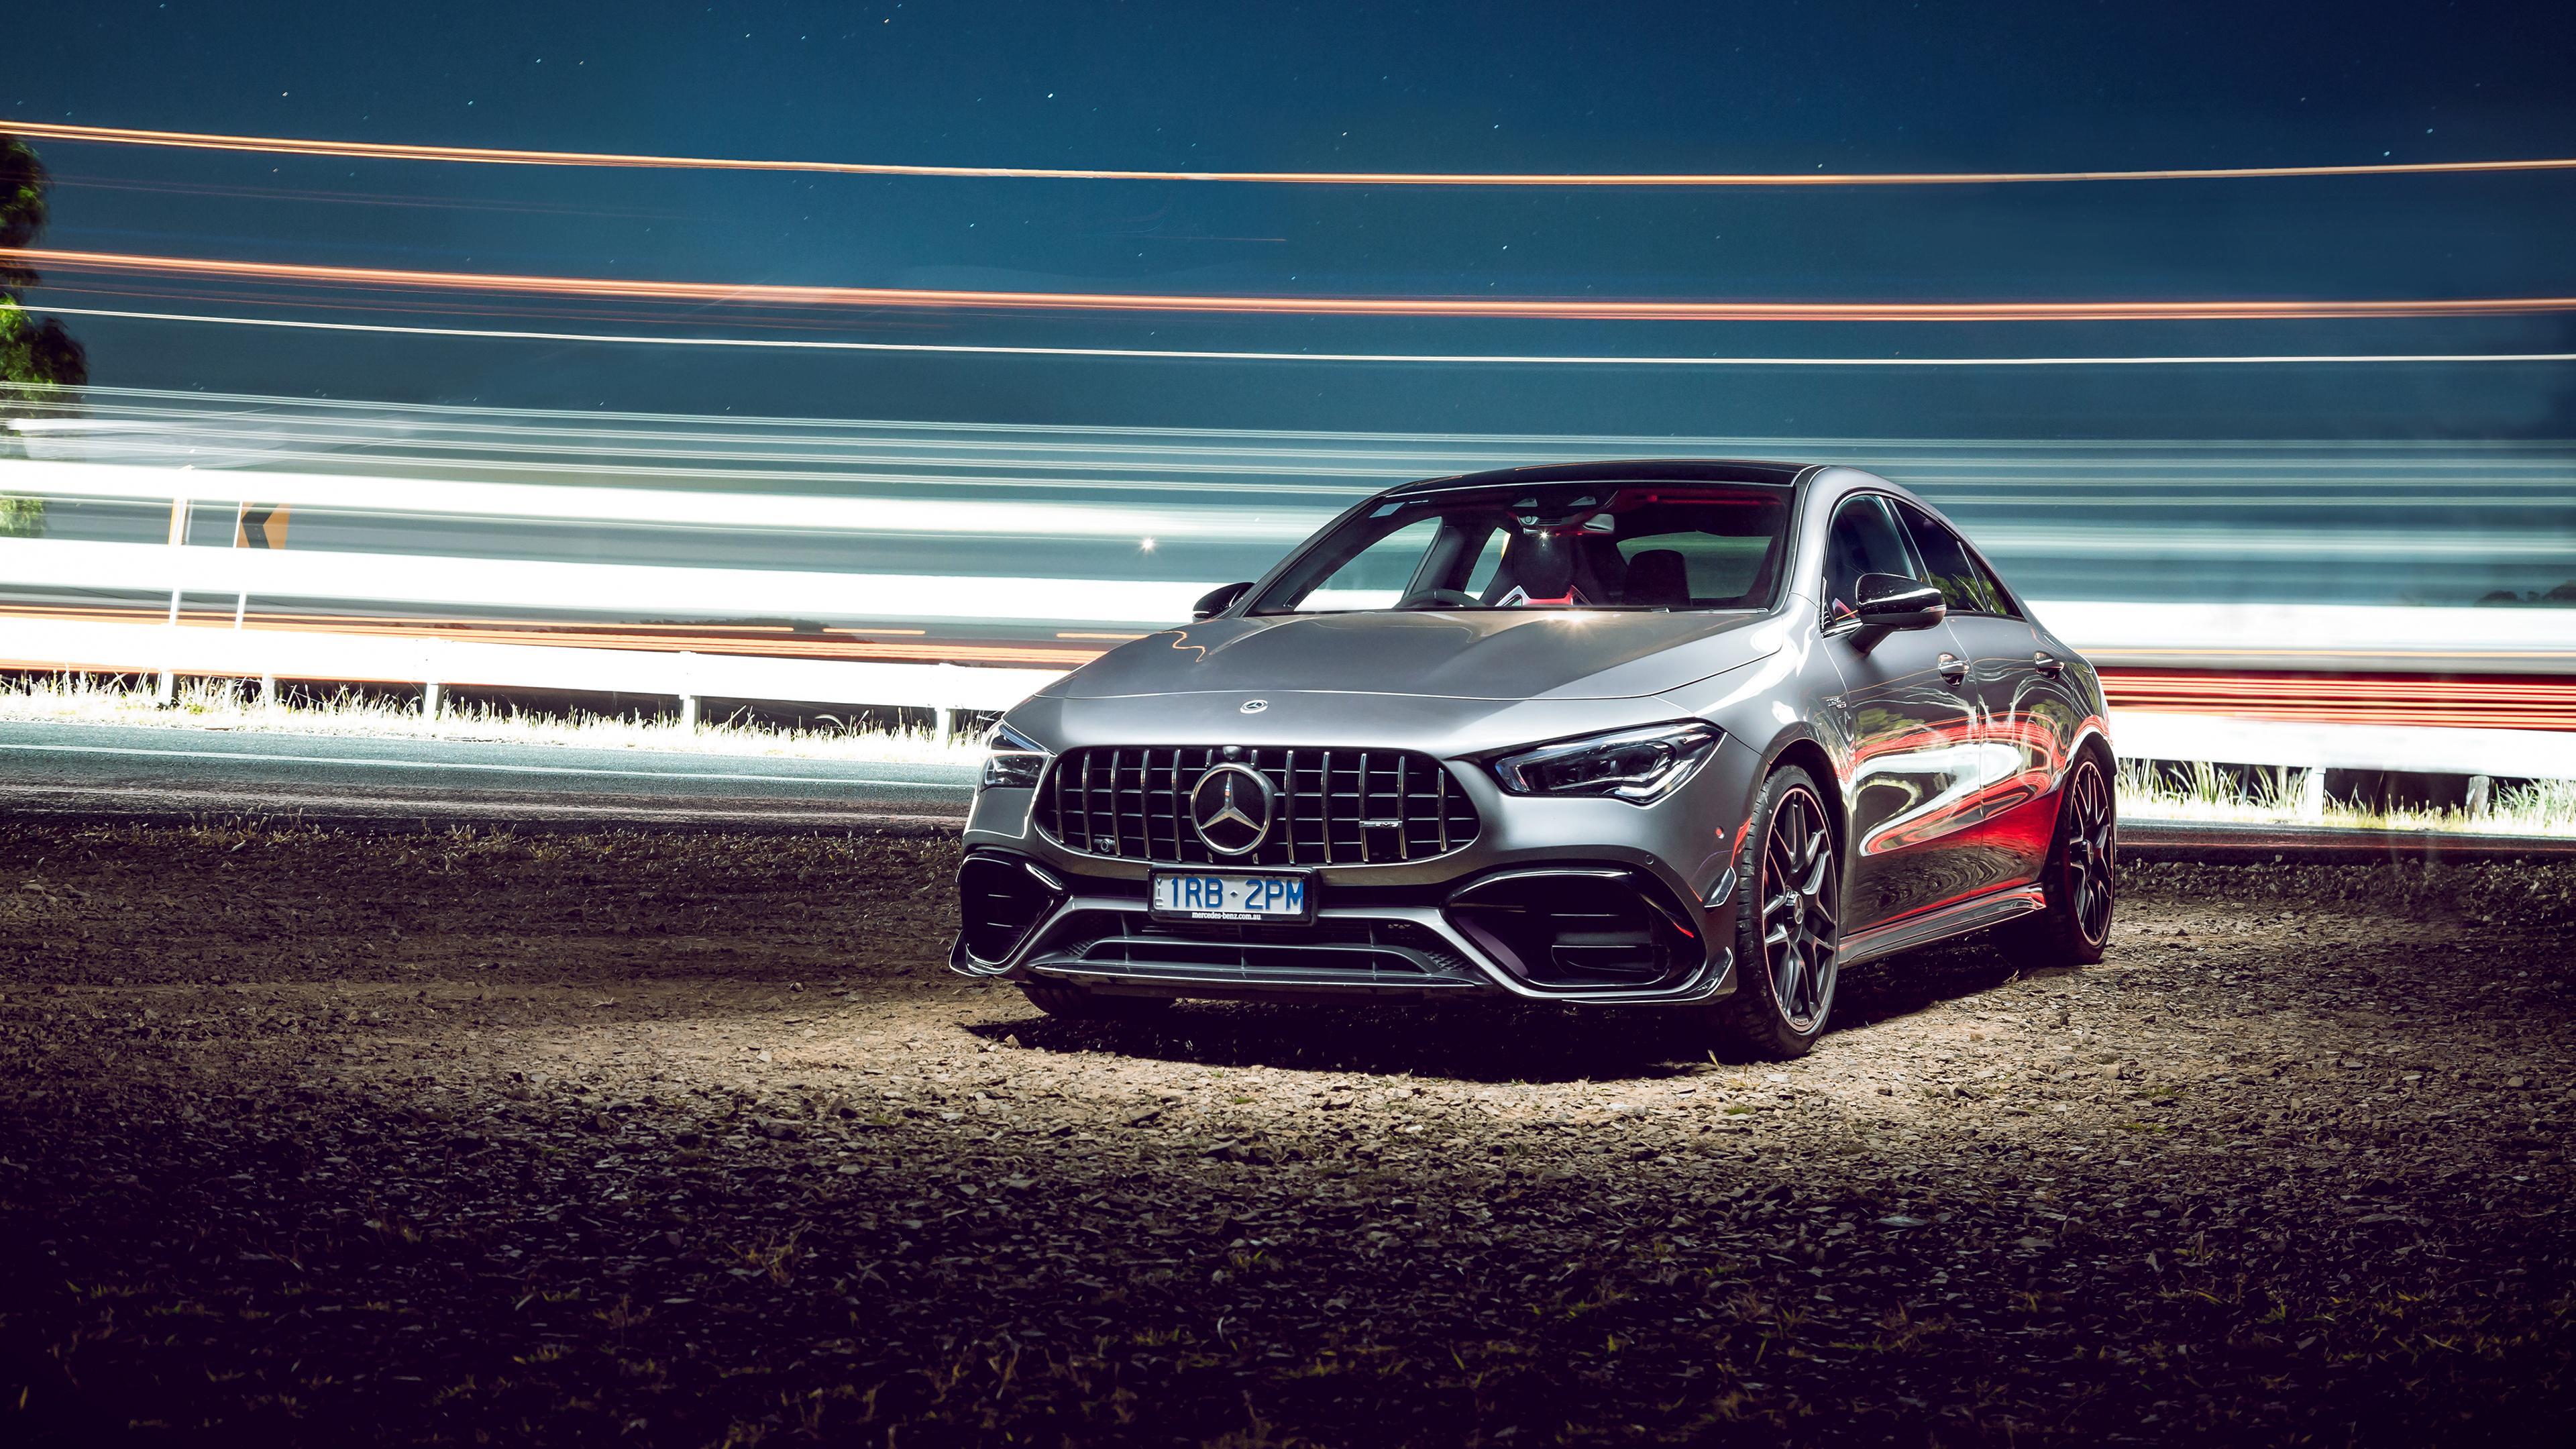 Download Mercedes Benz Cla 45 Amg 4K Wallpaper  Images